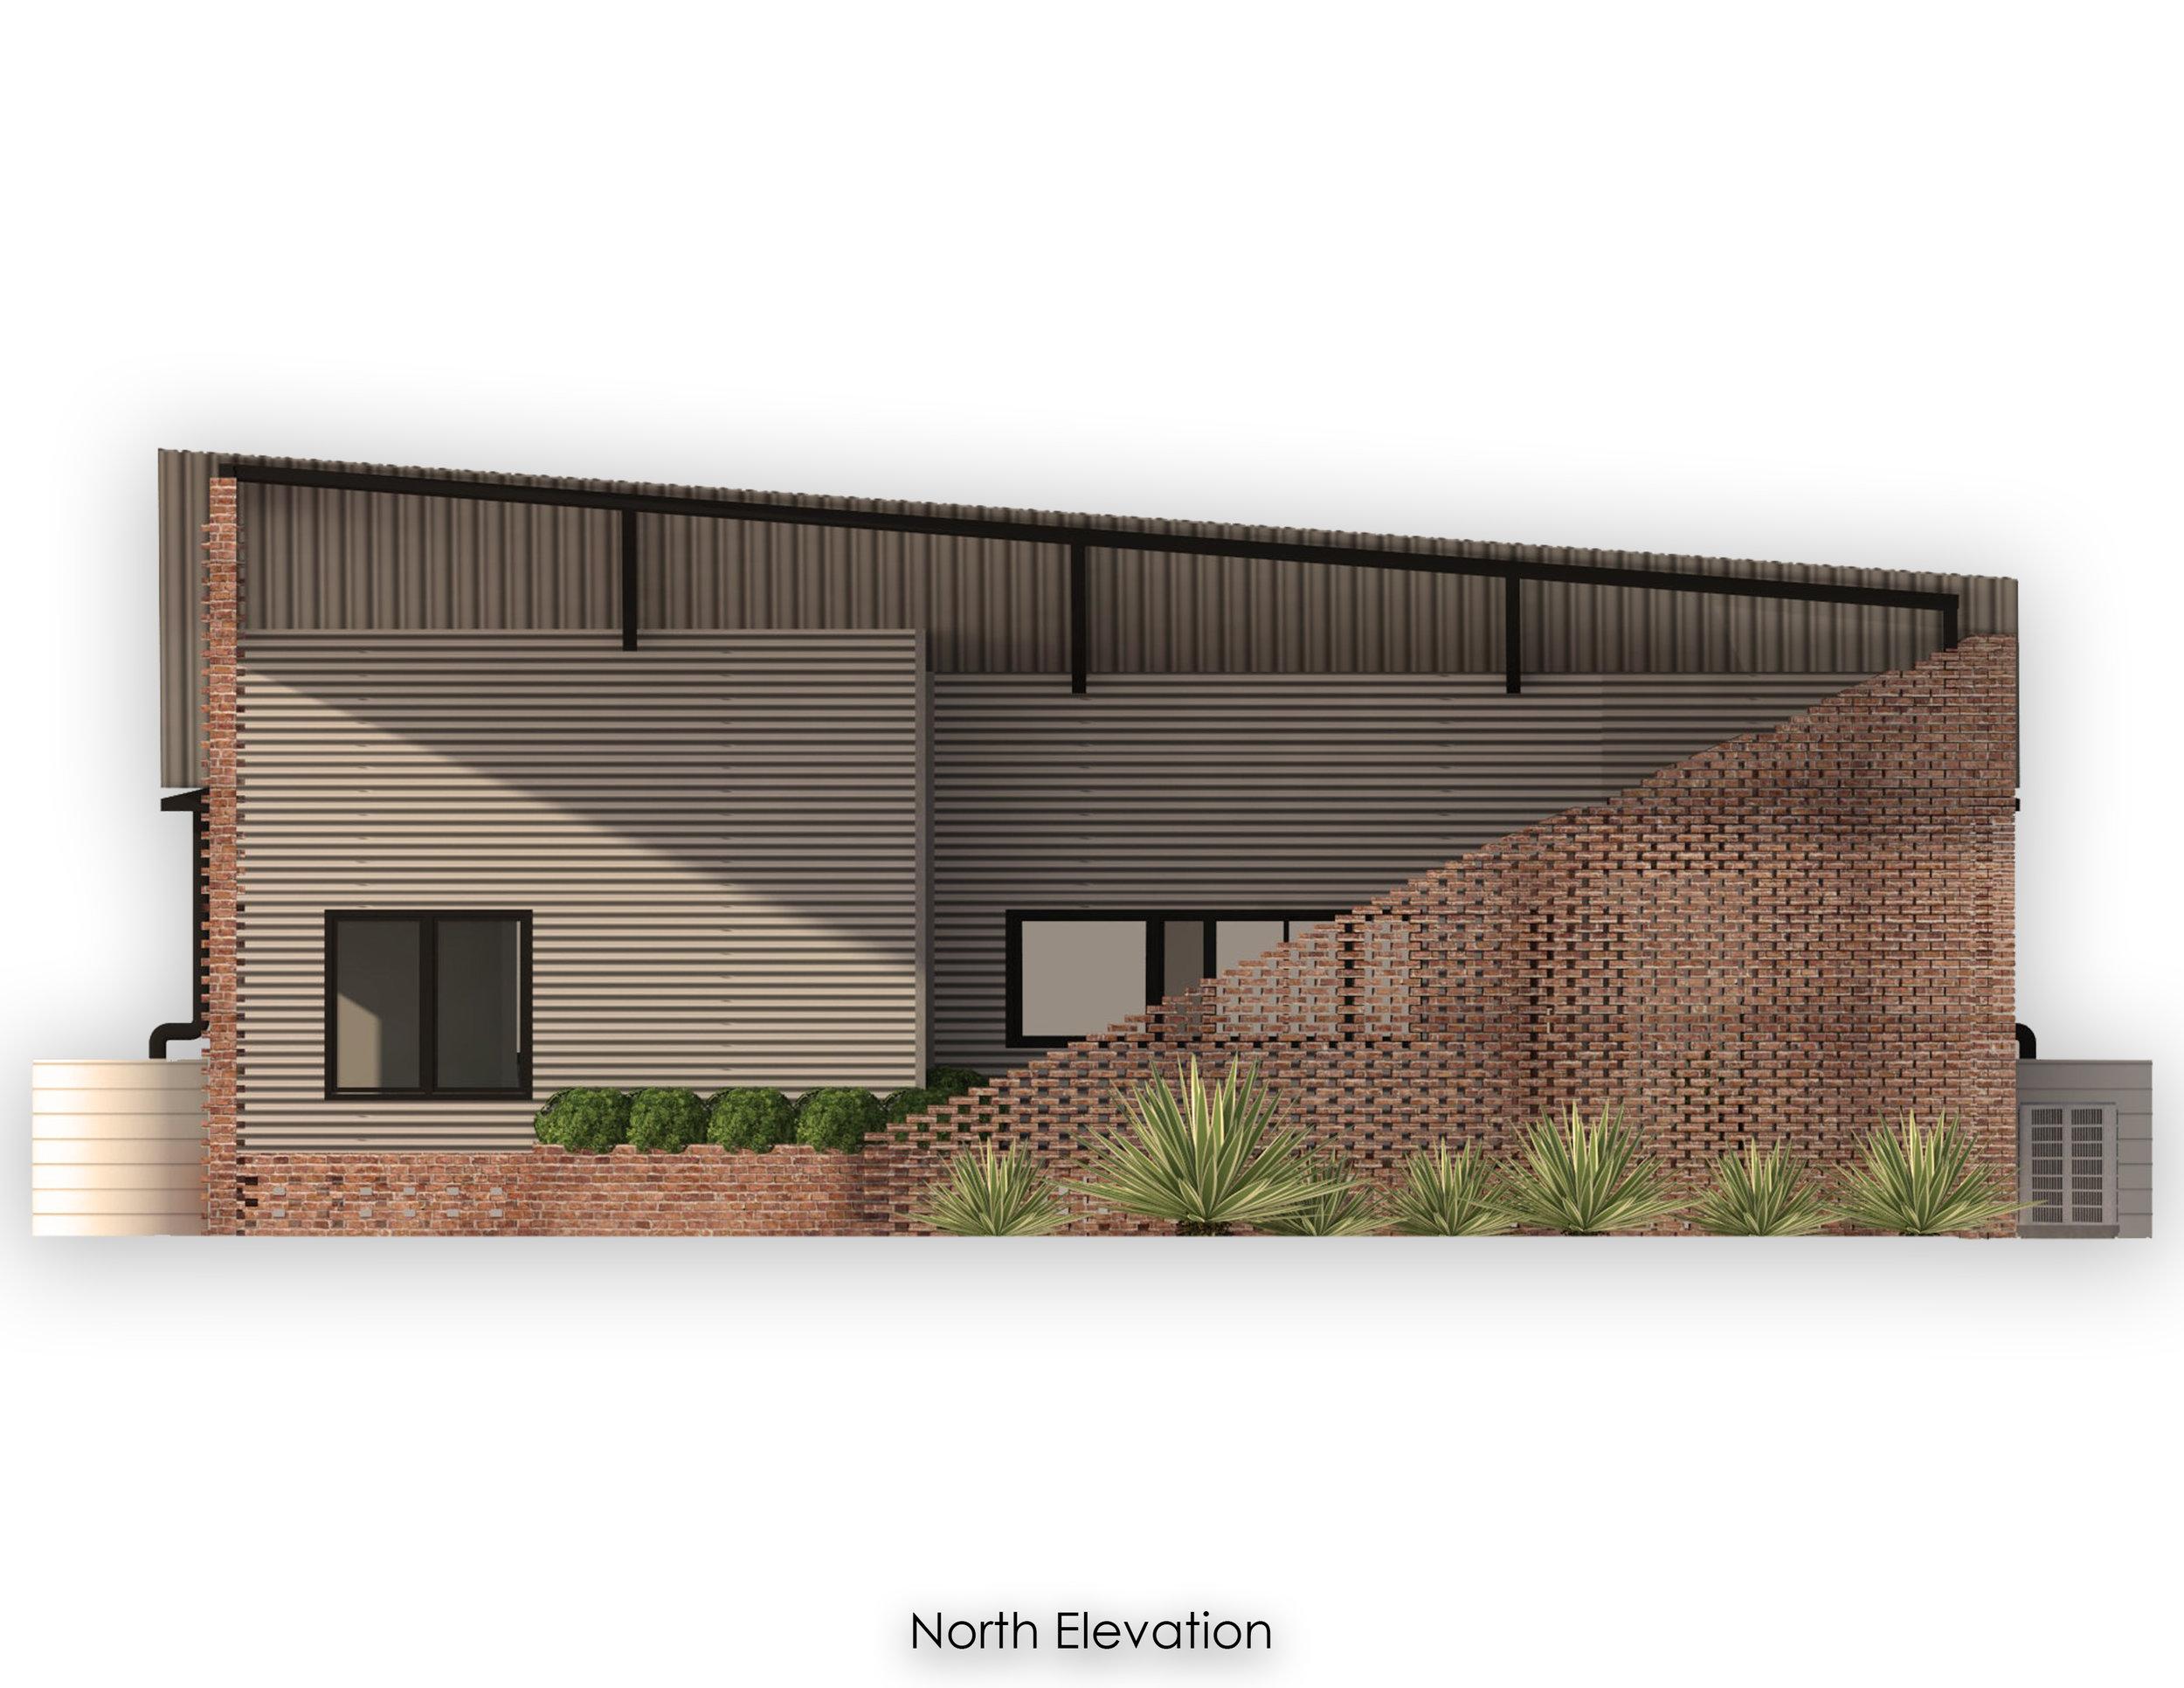 4_North_Elevation.jpg